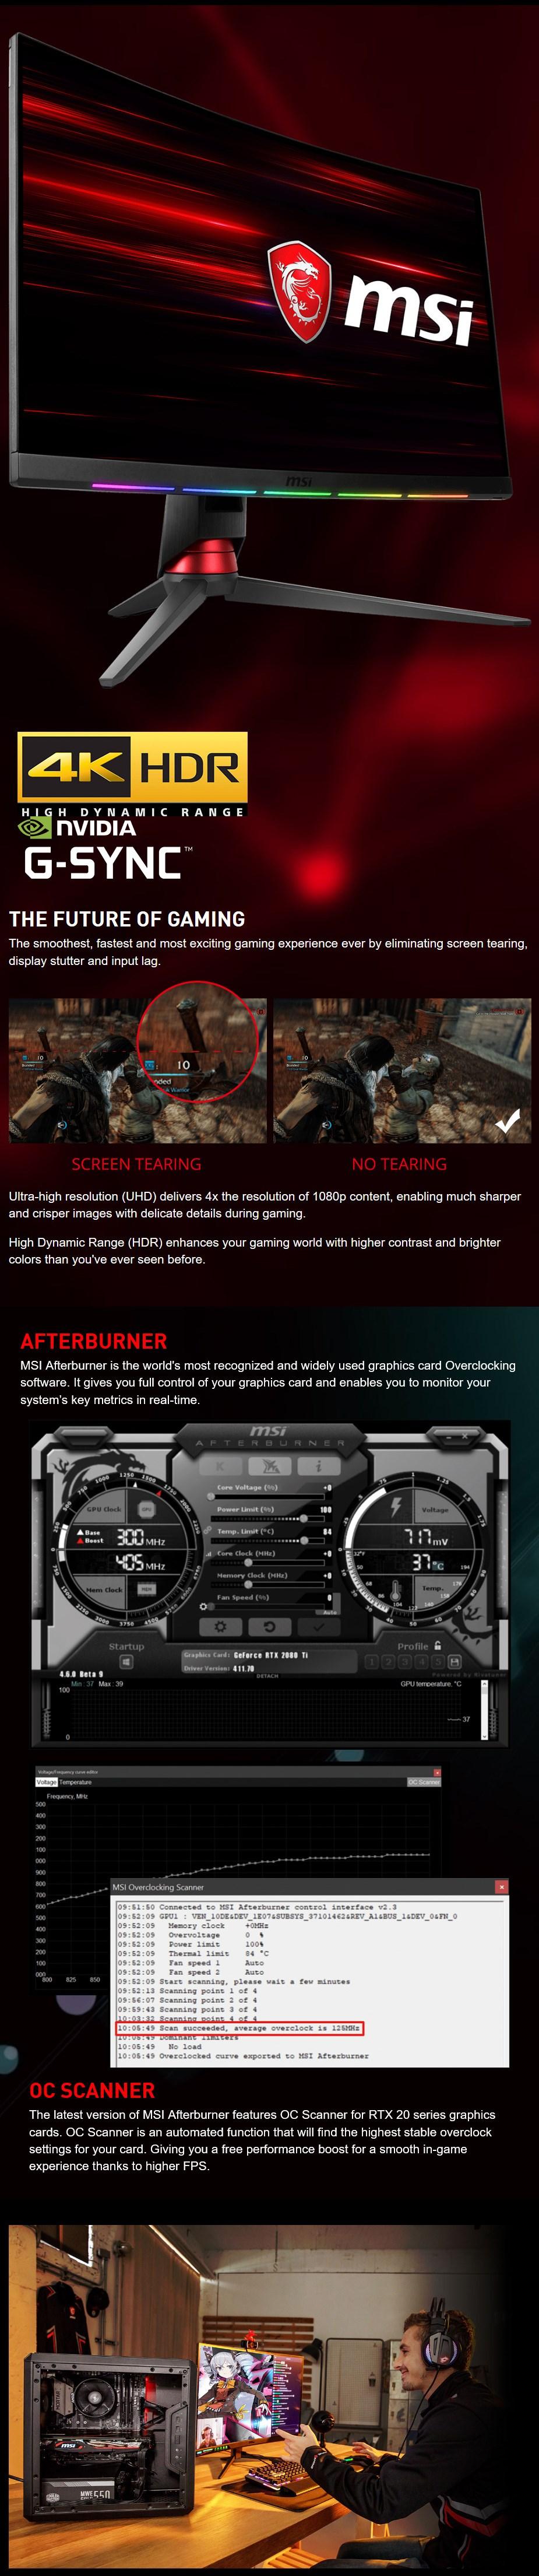 MSI GeForce RTX 2070 AERO ITX 8GB Video Card - Desktop Overview 2